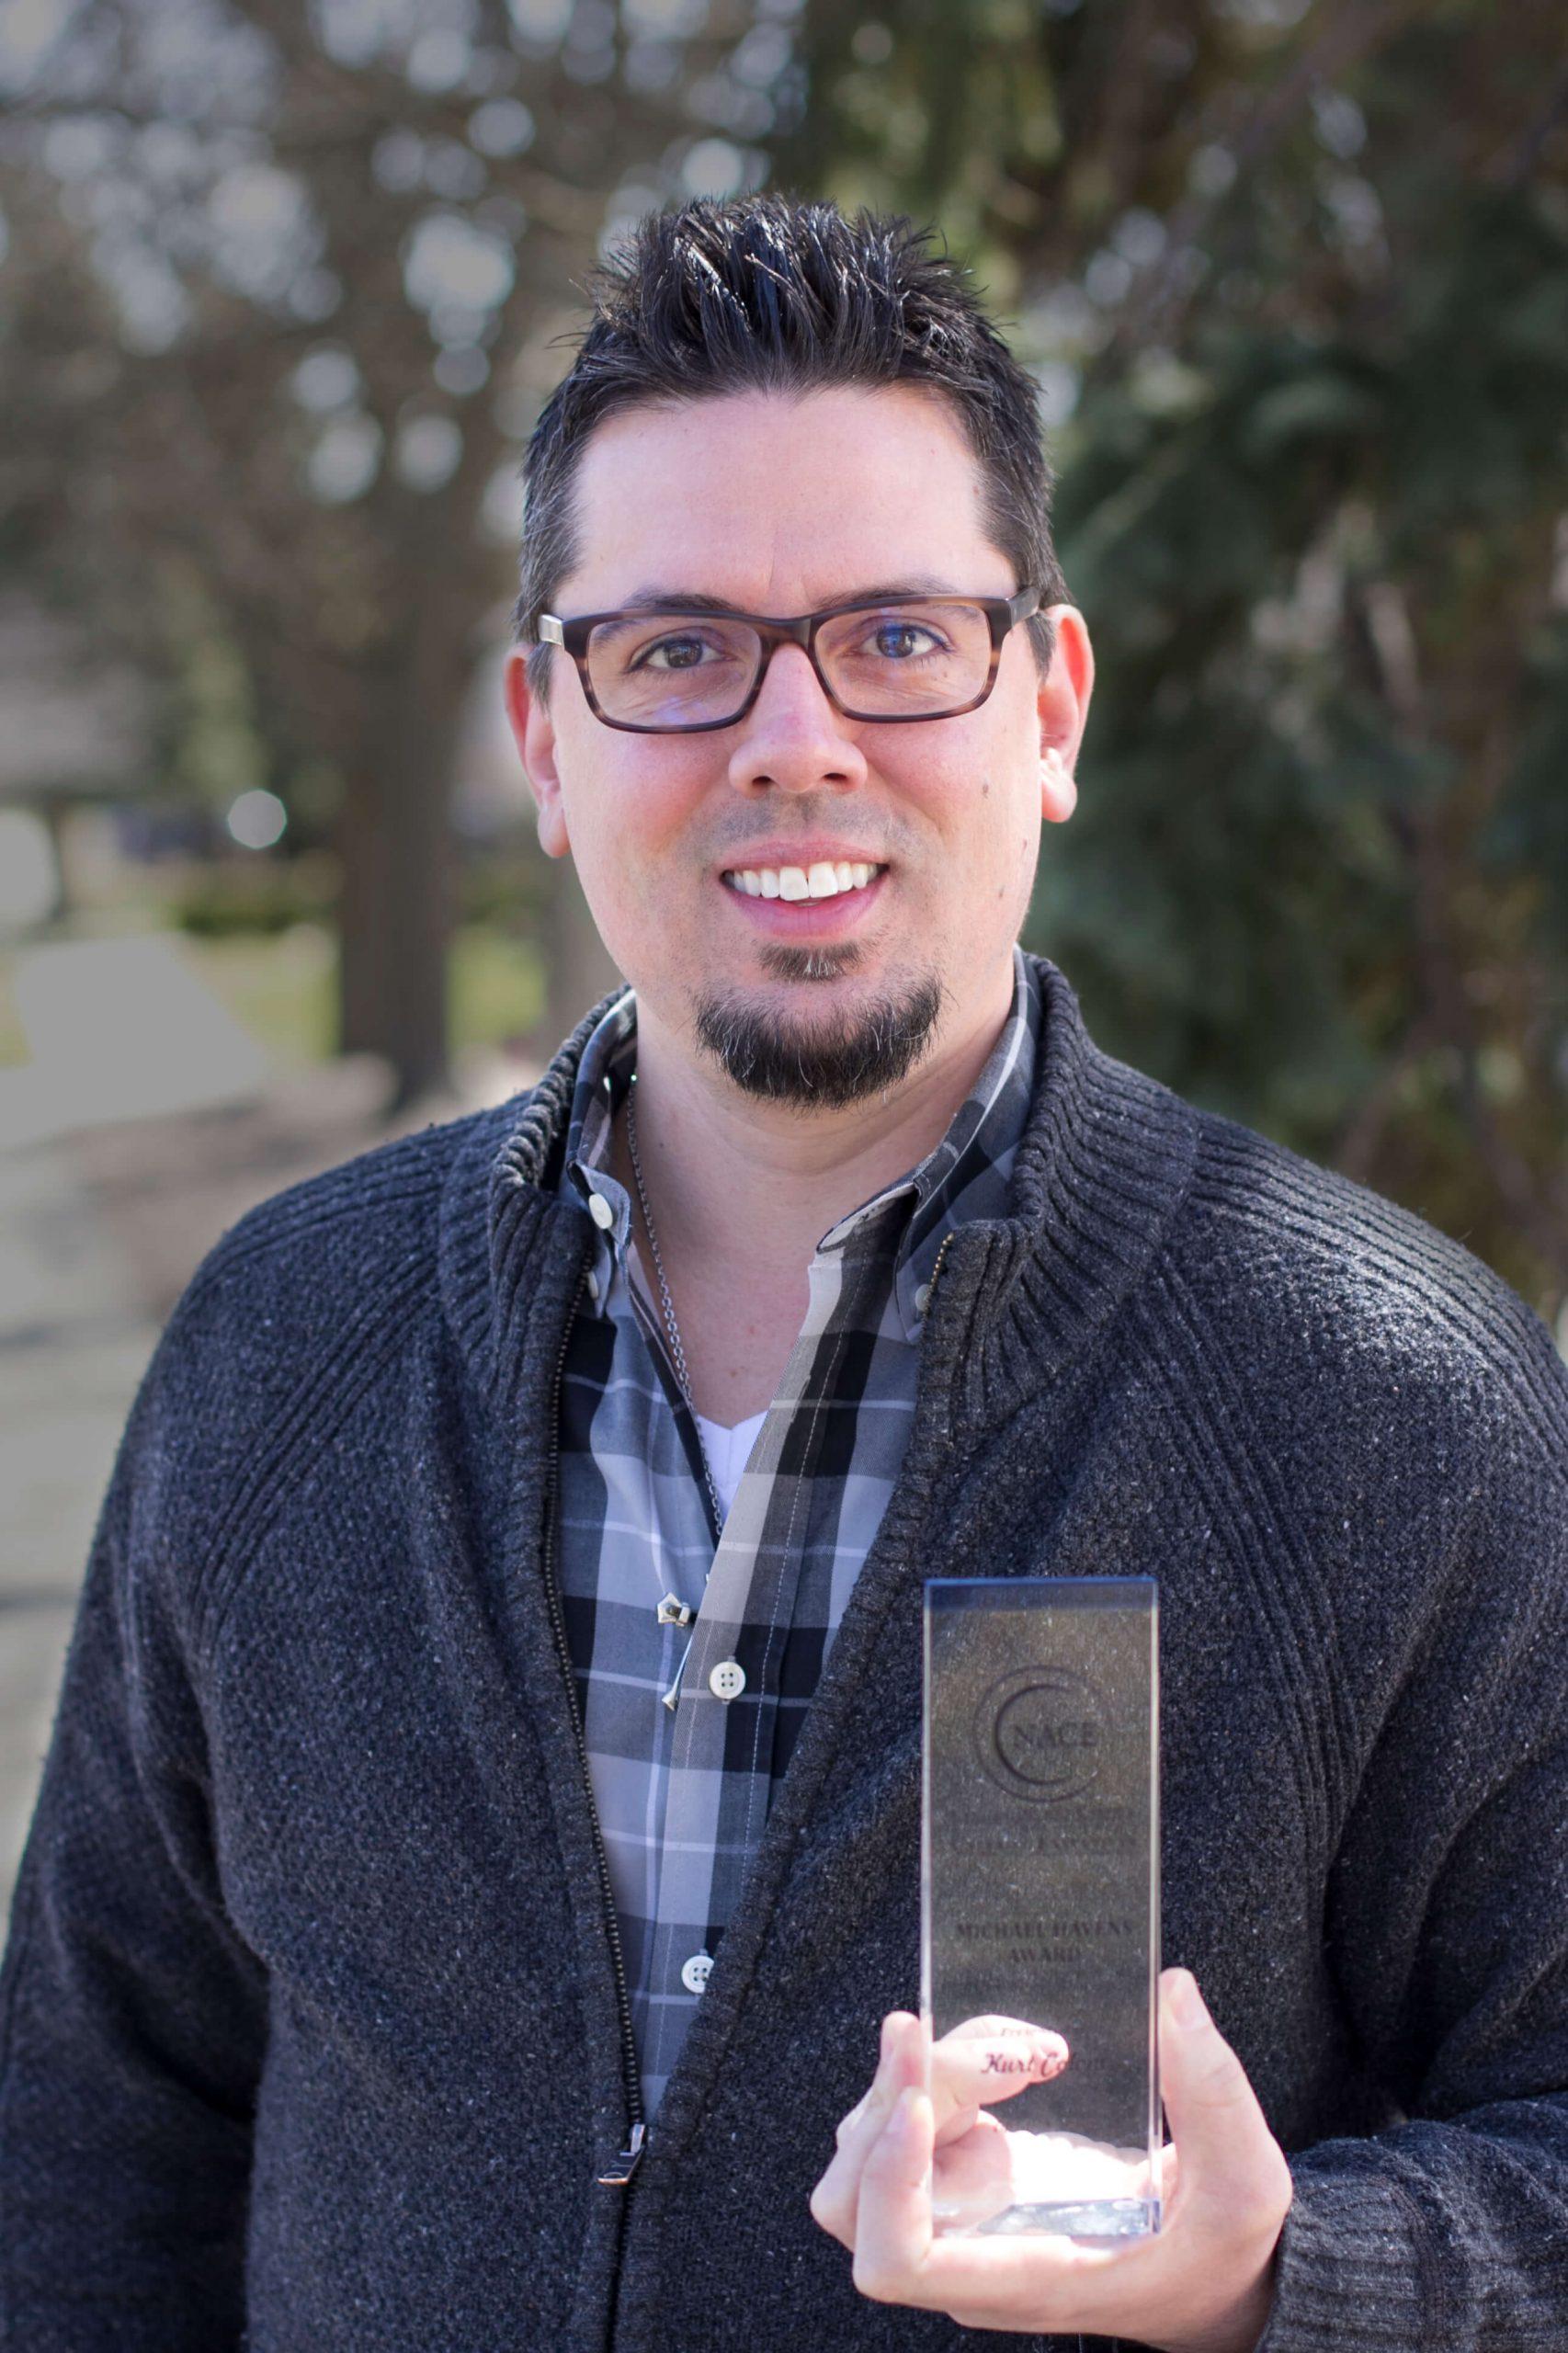 Kurt Award scaled